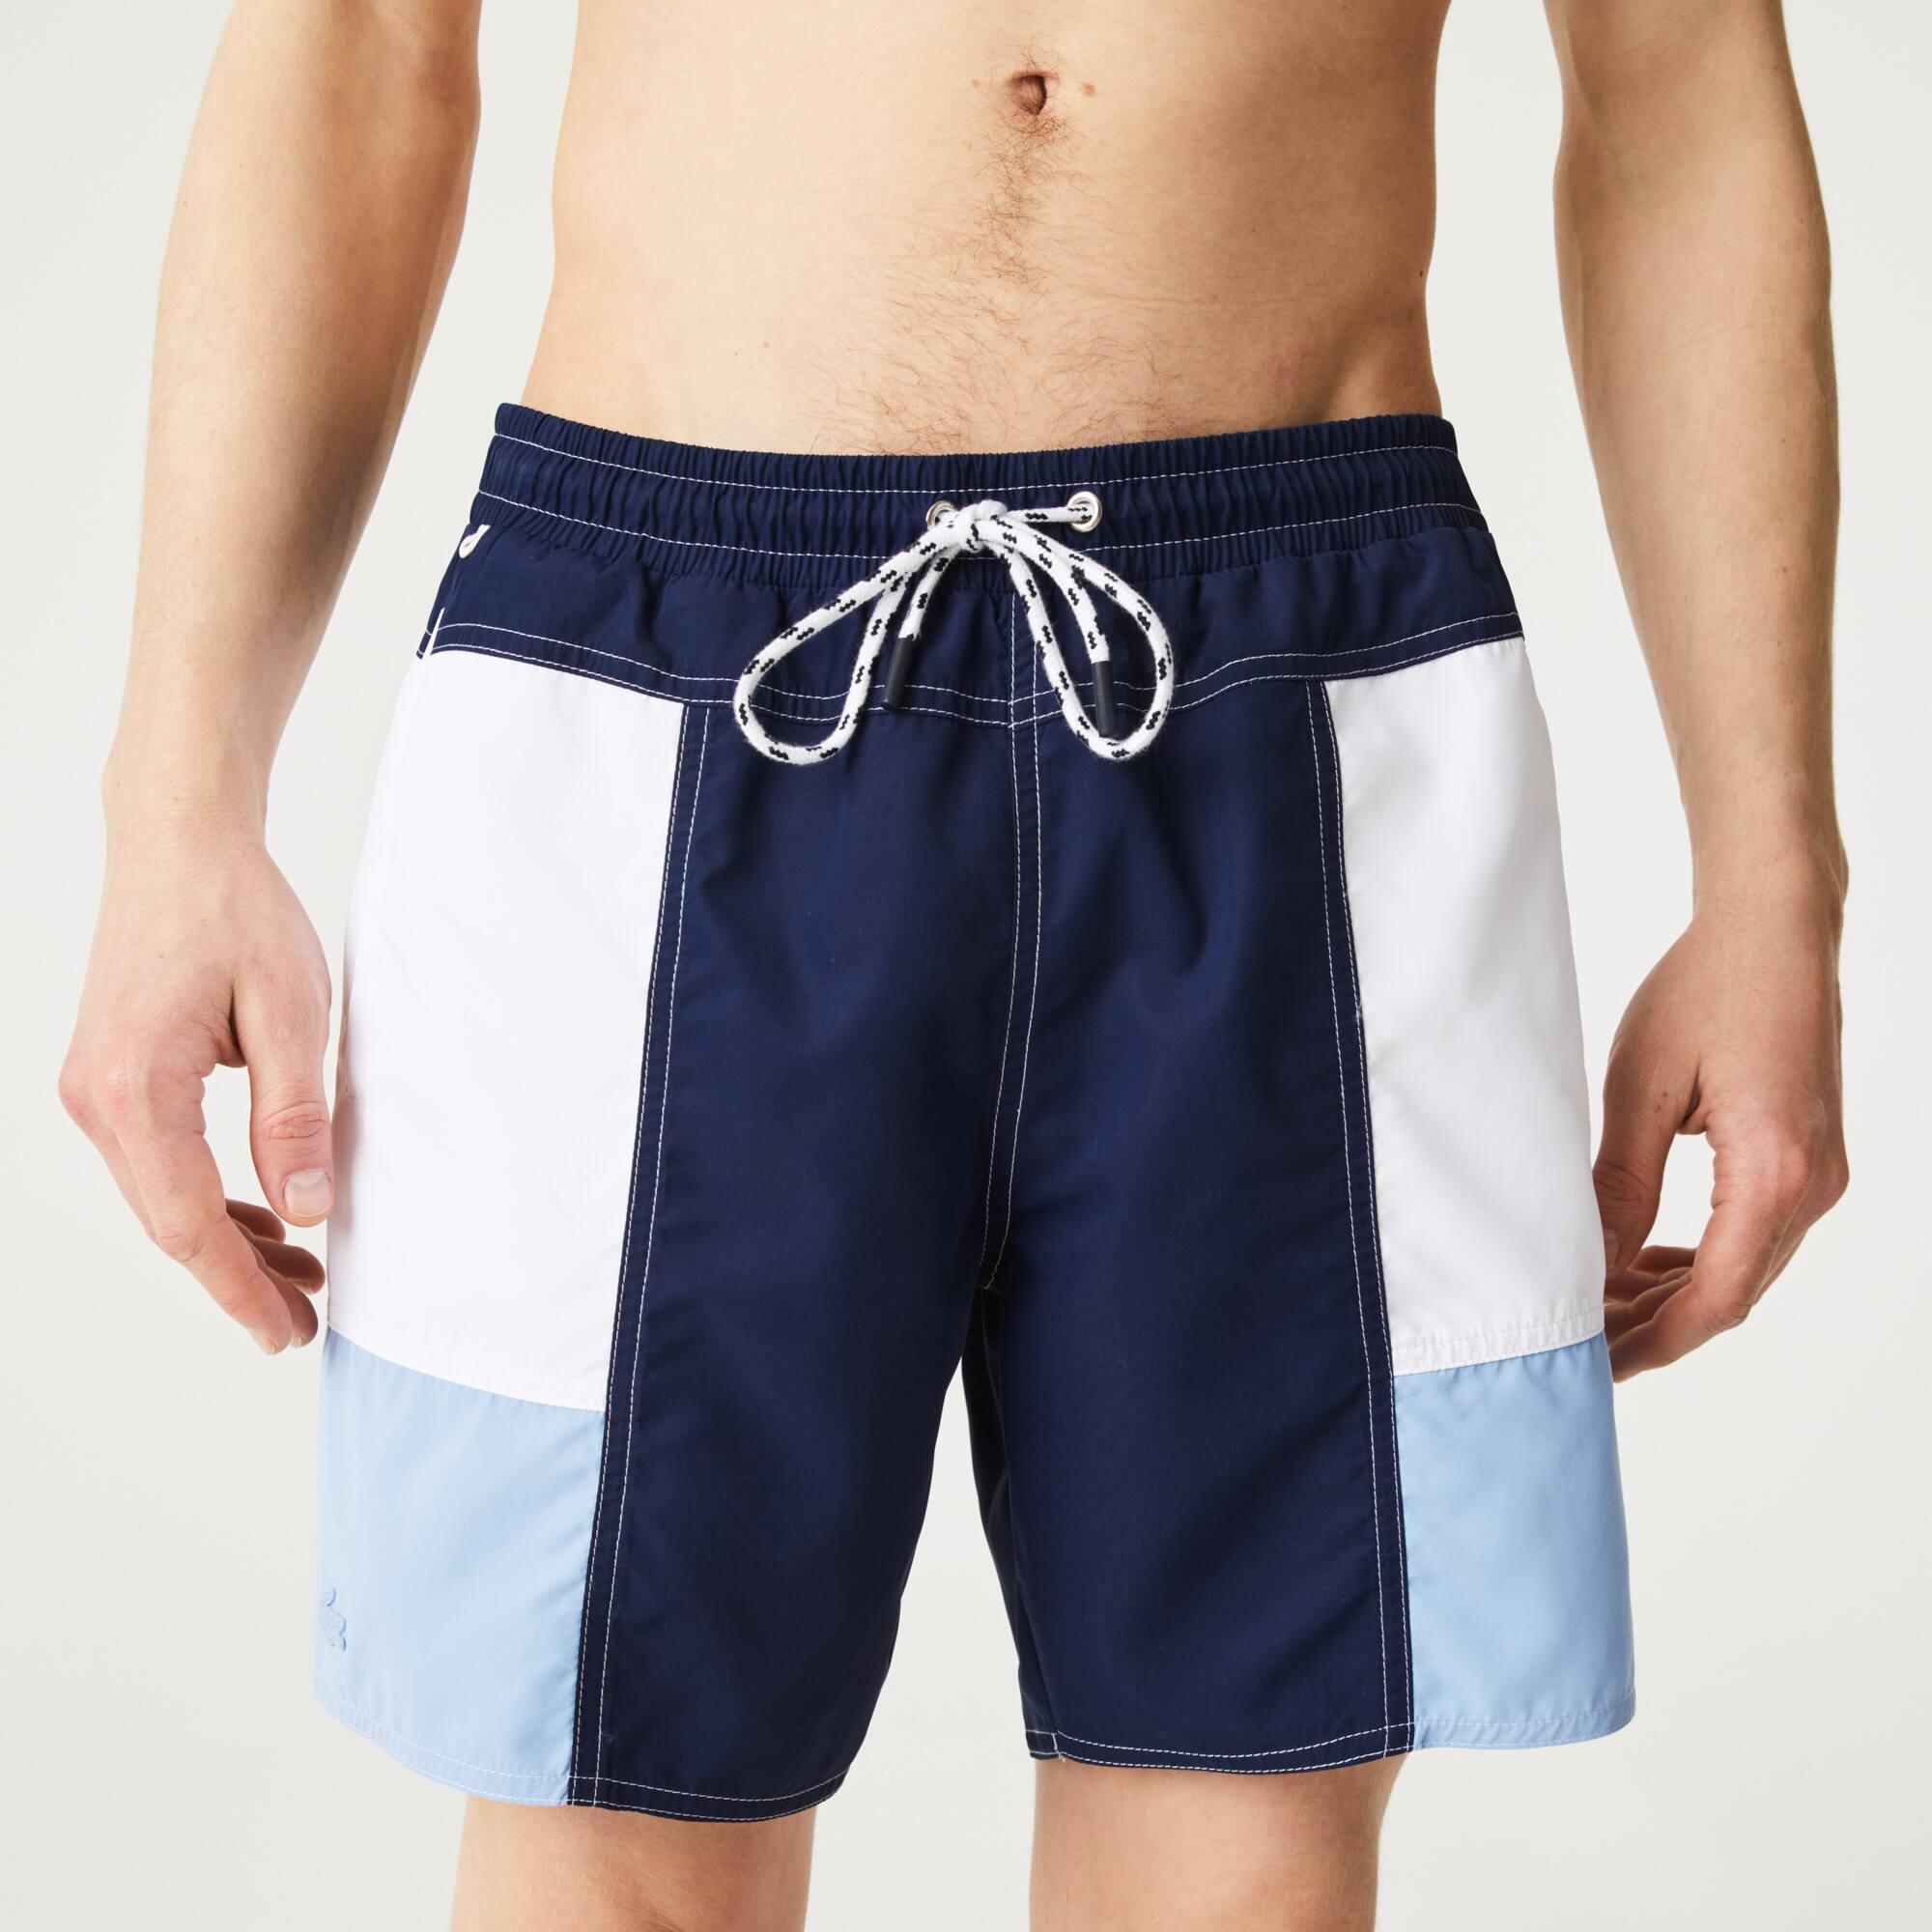 Ear plug /& Nose-zI4 Size-4XL Googles Trunks Details about  /Morex Swimming Cap